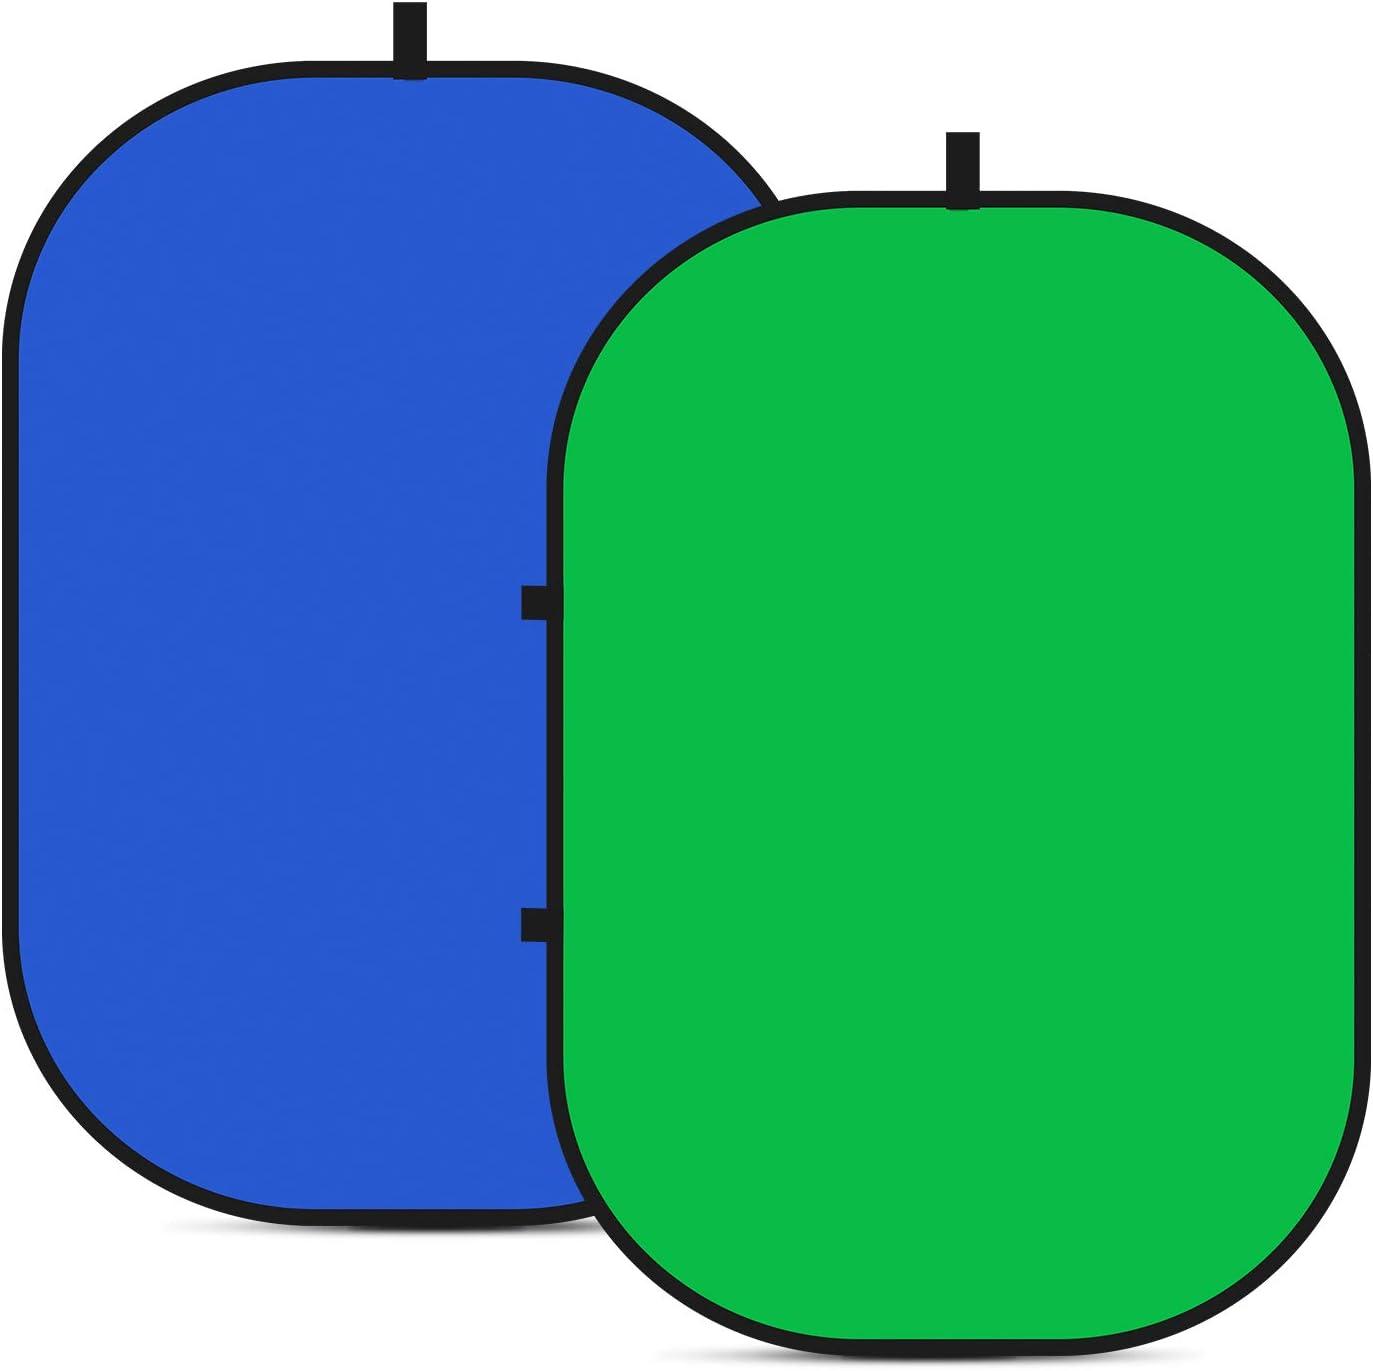 Neewer Fondo Plegable Reversible Chromakey Green Chromakey Blue 150 * 200CM Chroma-Key Azul / Verde